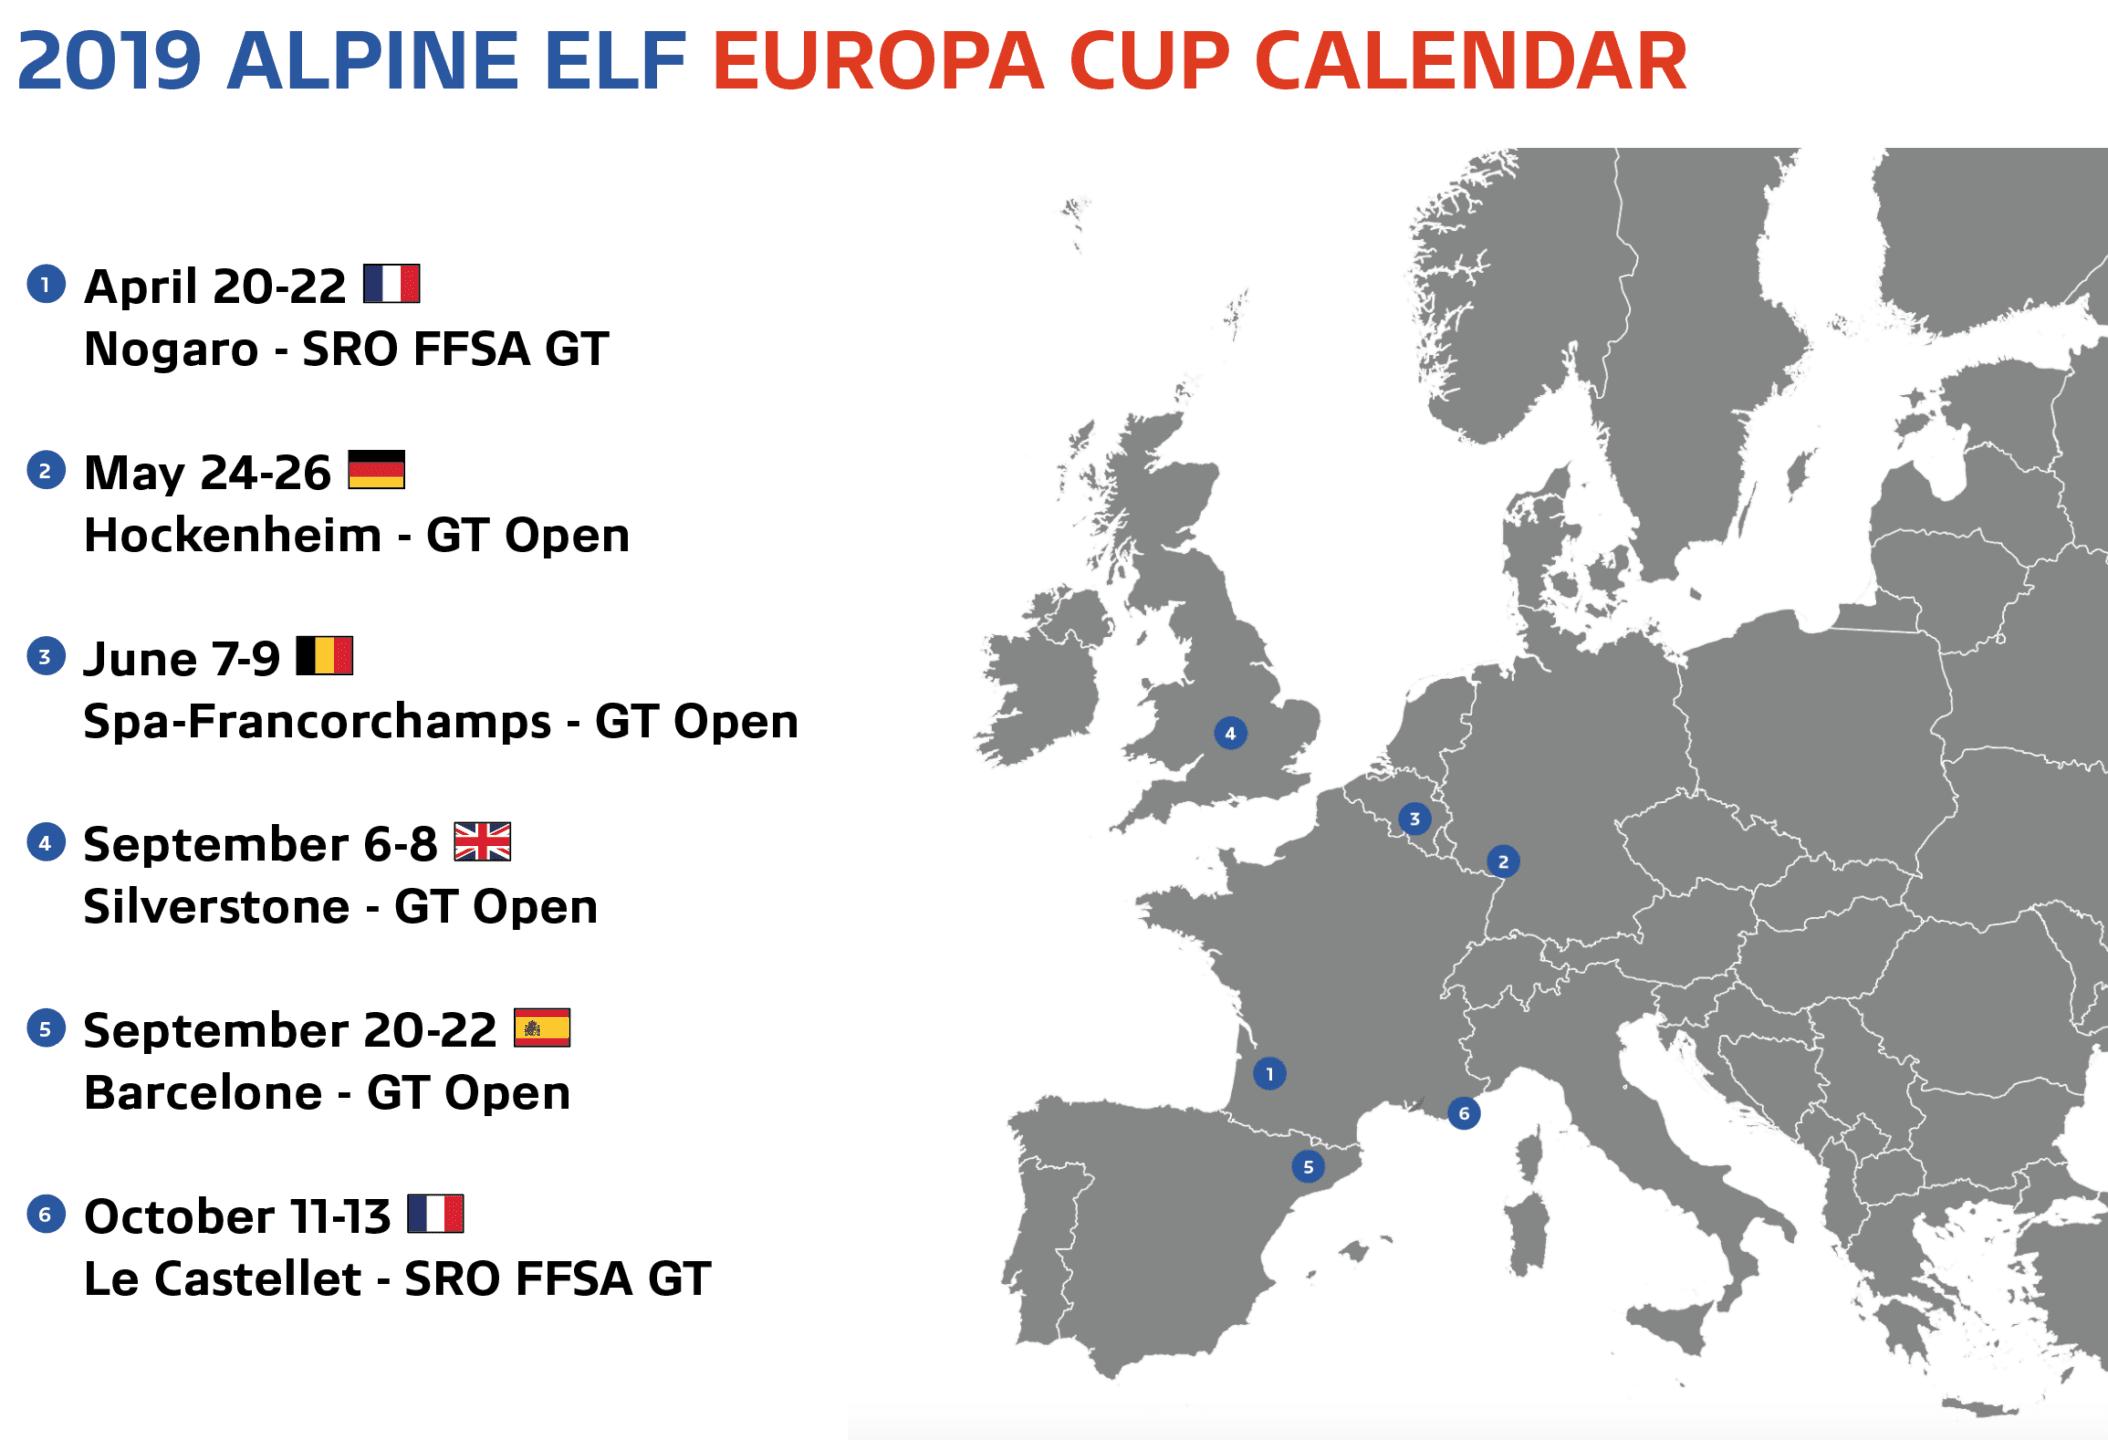 Alpine Elf Europa Cup programme calendrier 2019 | Alpine Elf Europa Cup: par ici le programme 2019 !